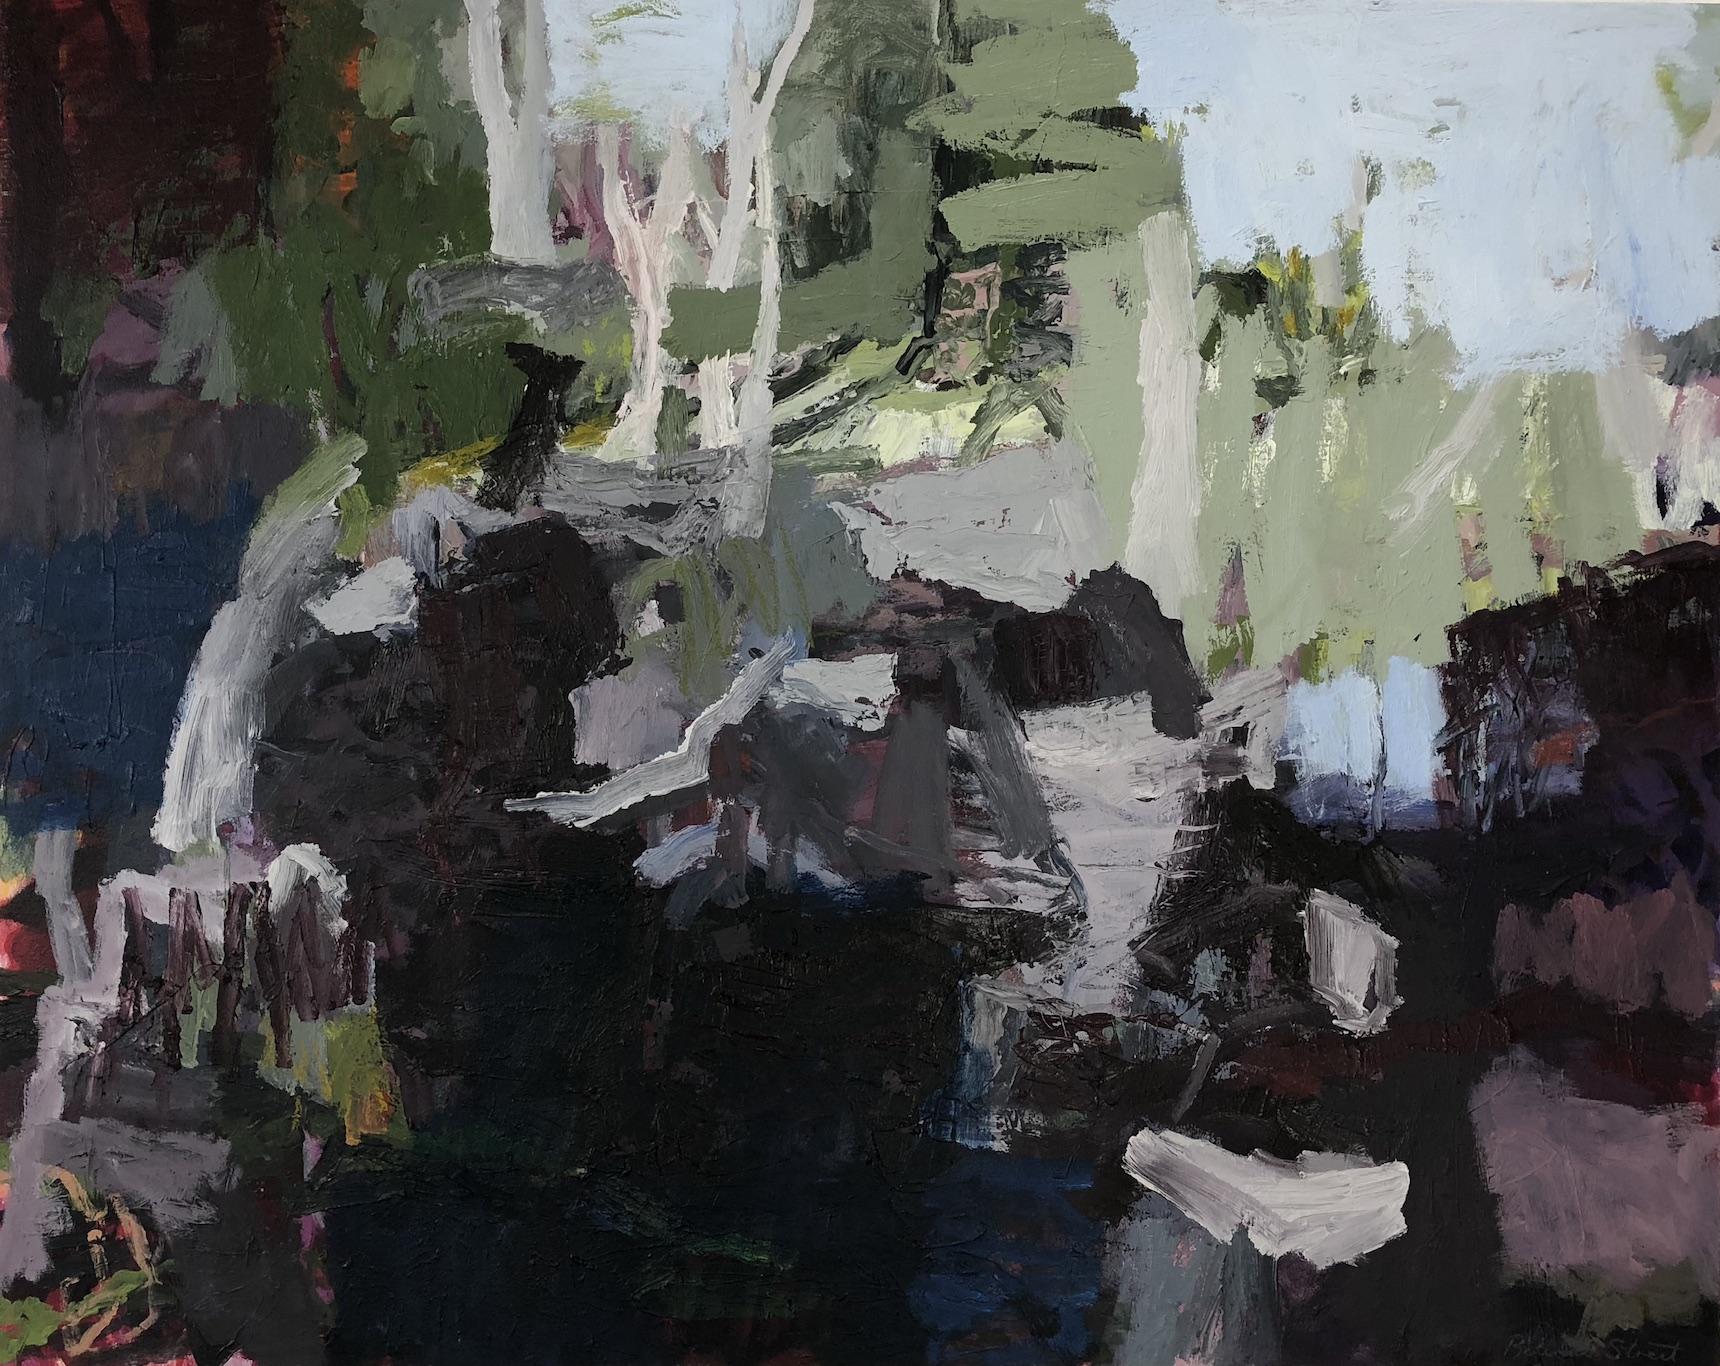 Belinda Street   Ganguddy Reflections  2018 oil on canvas 80 x 100cm  $2500.00